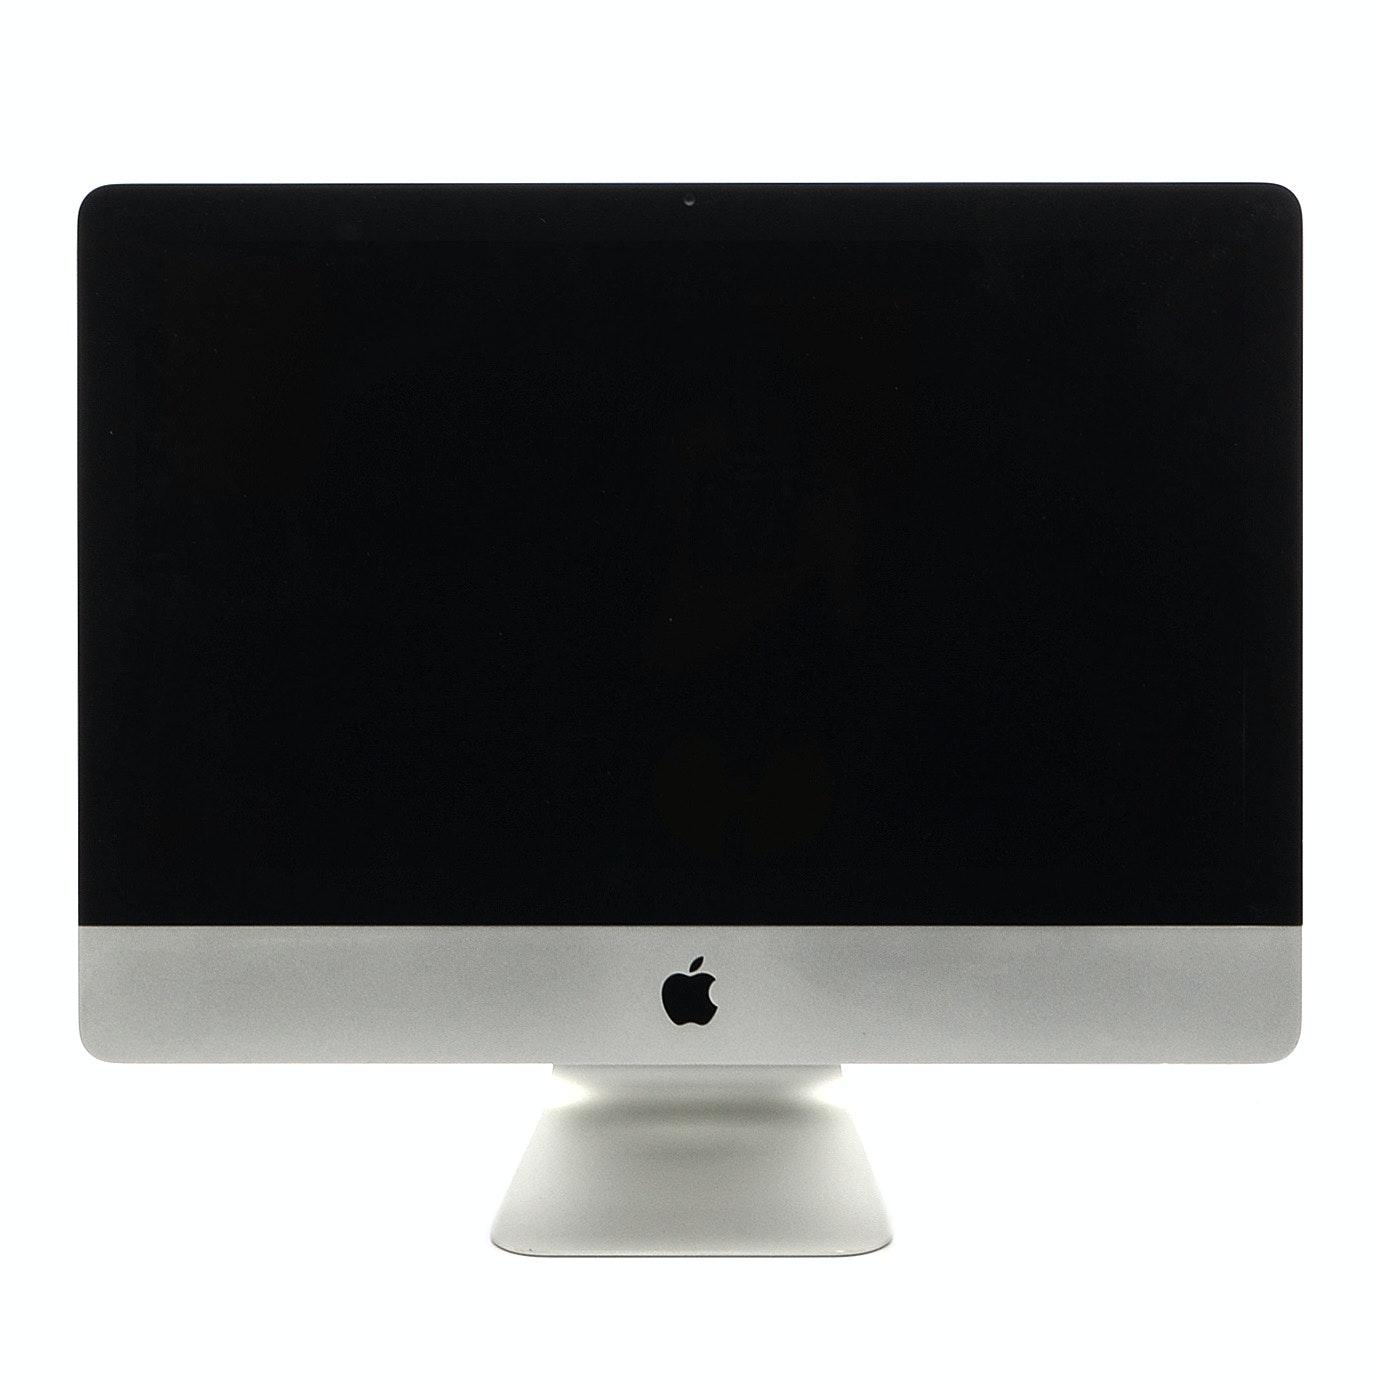 21.5' iMac Desktop